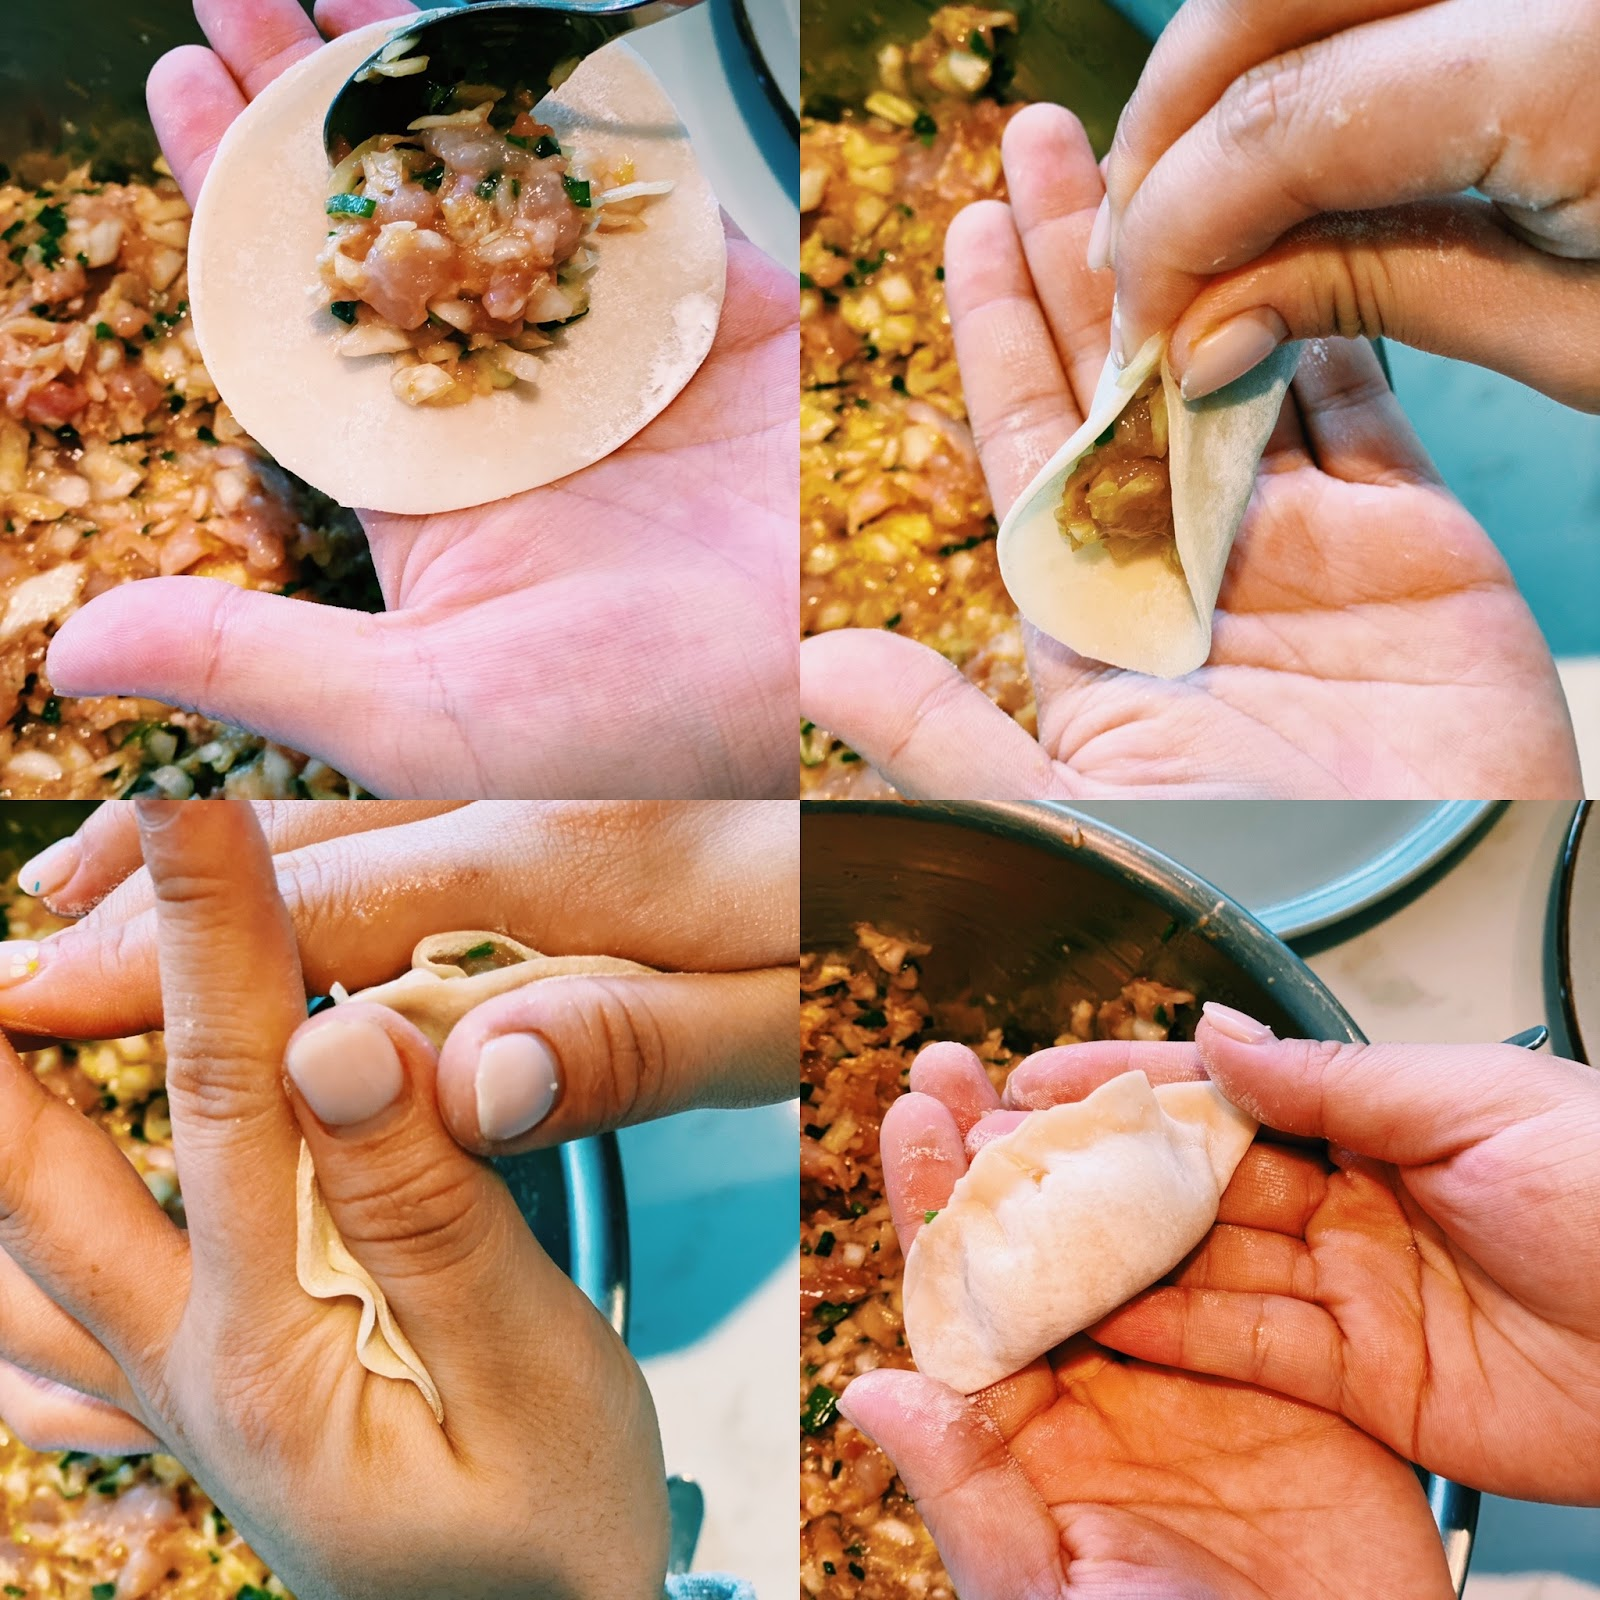 How to make Chicken dumpling